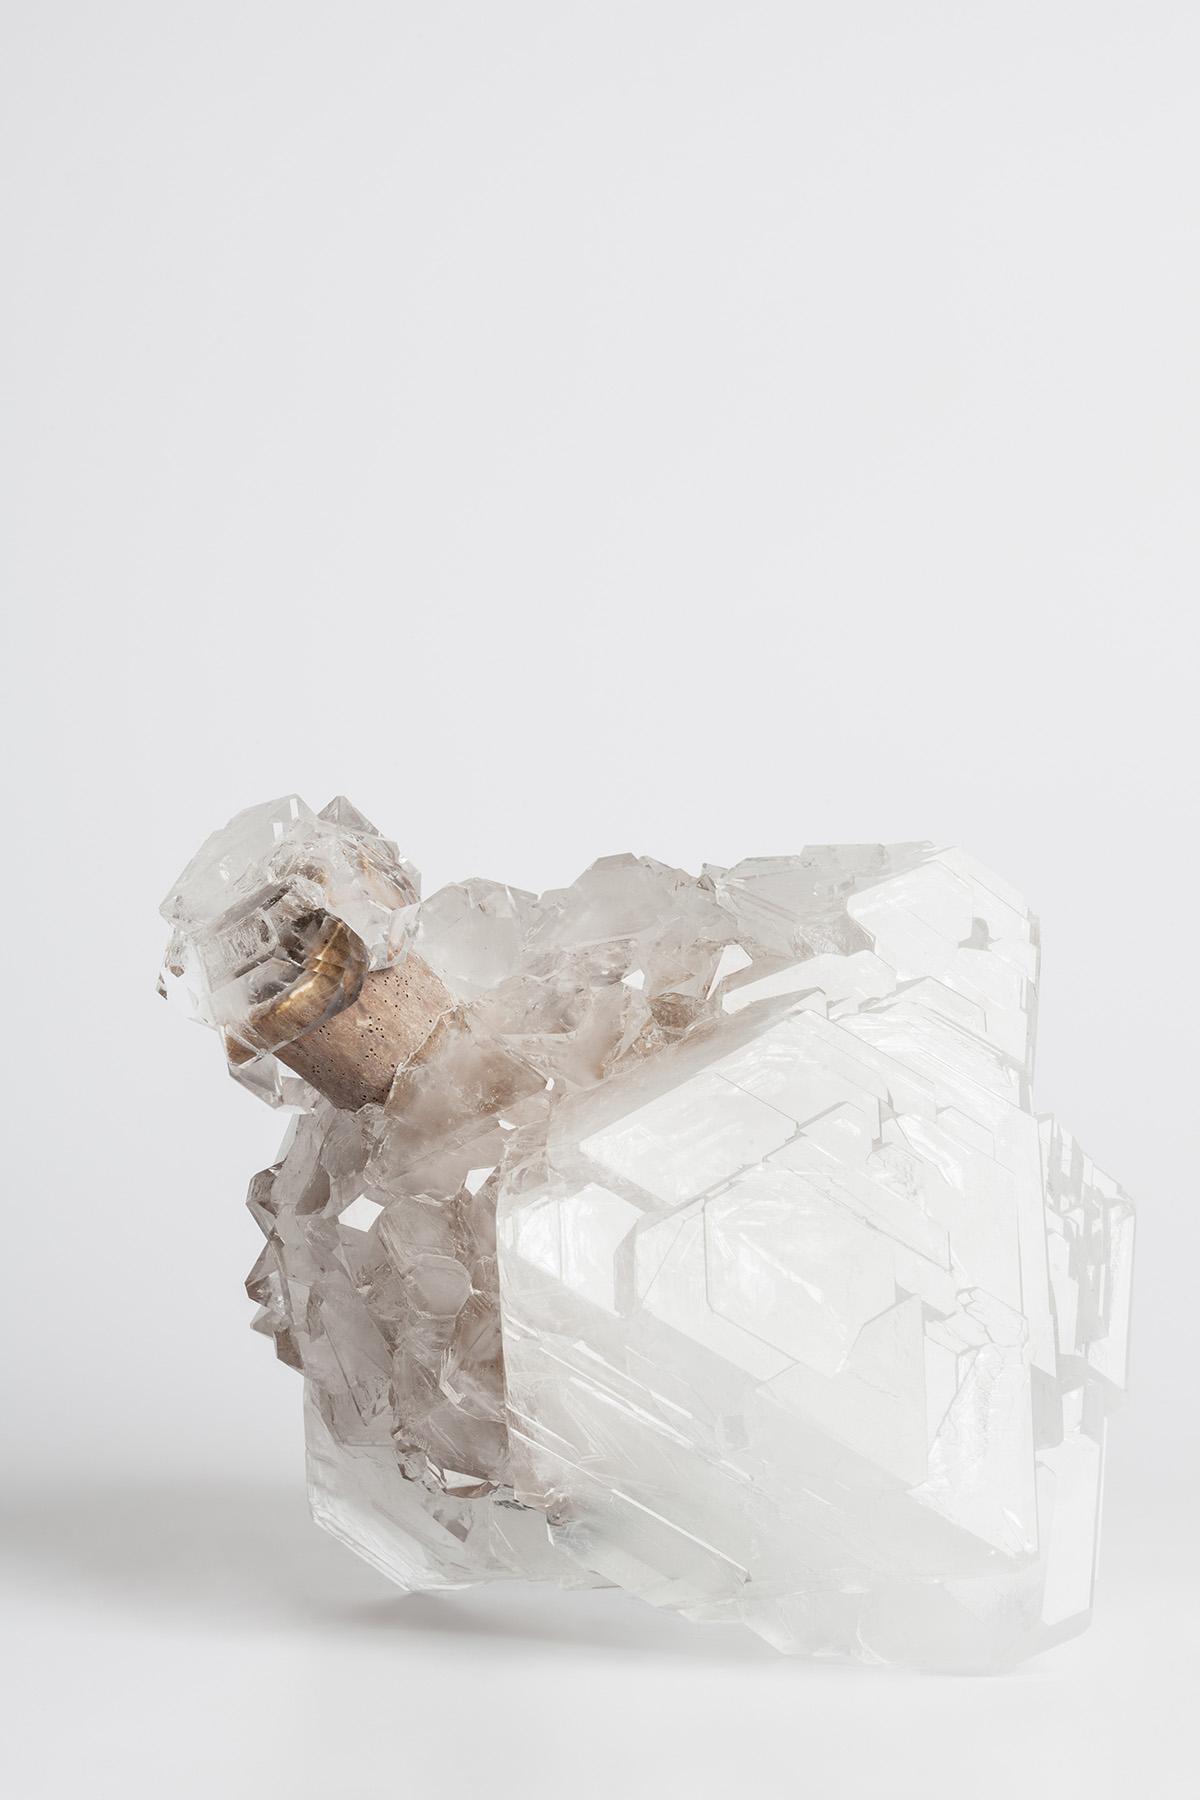 Crystallization 169